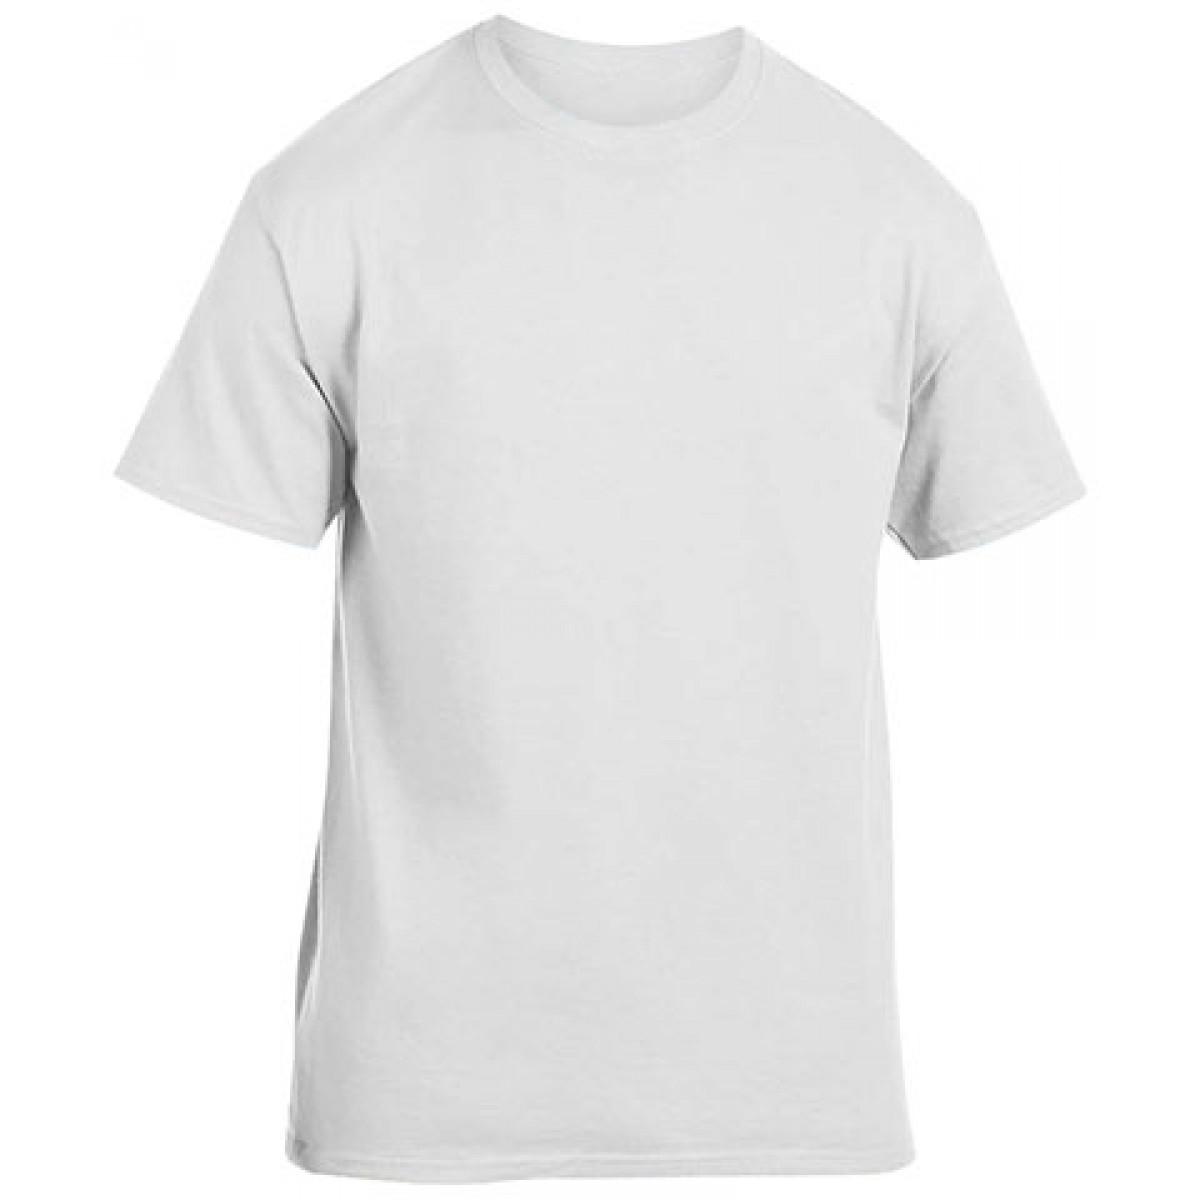 Heavy Cotton Activewear T-Shirt